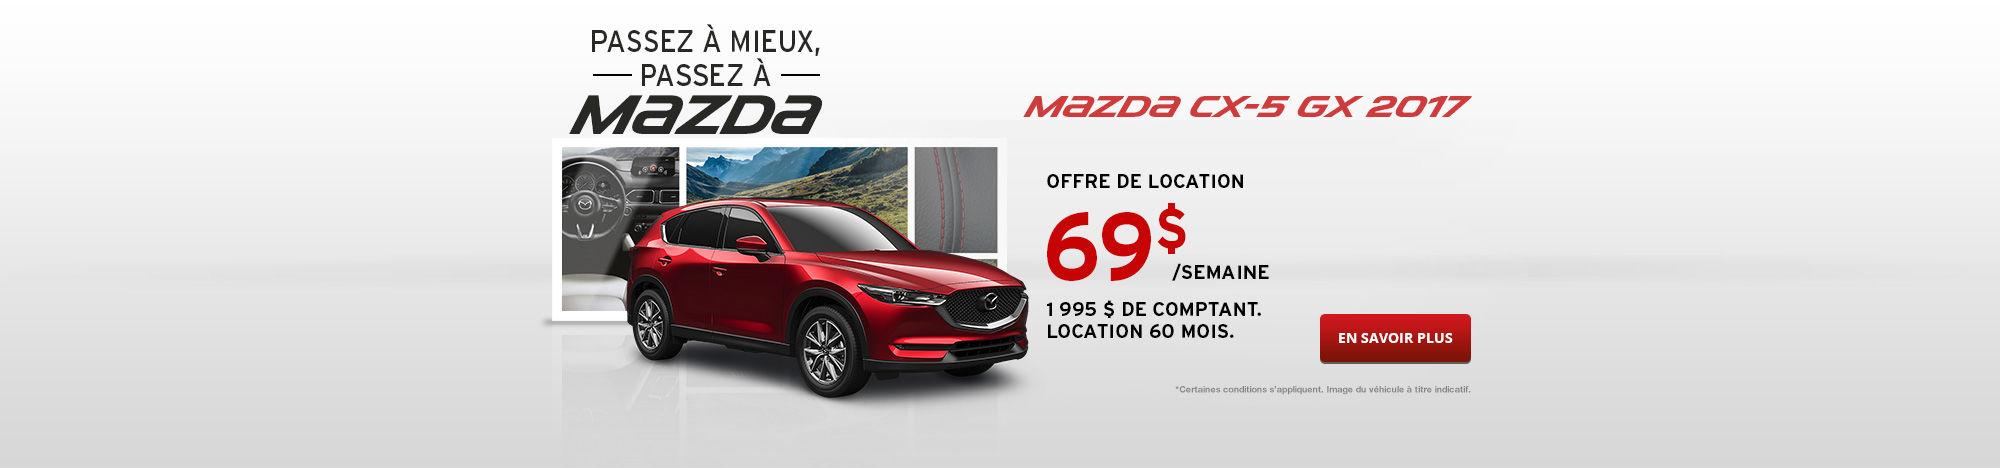 Passez à Mazda Septembre - CX-5